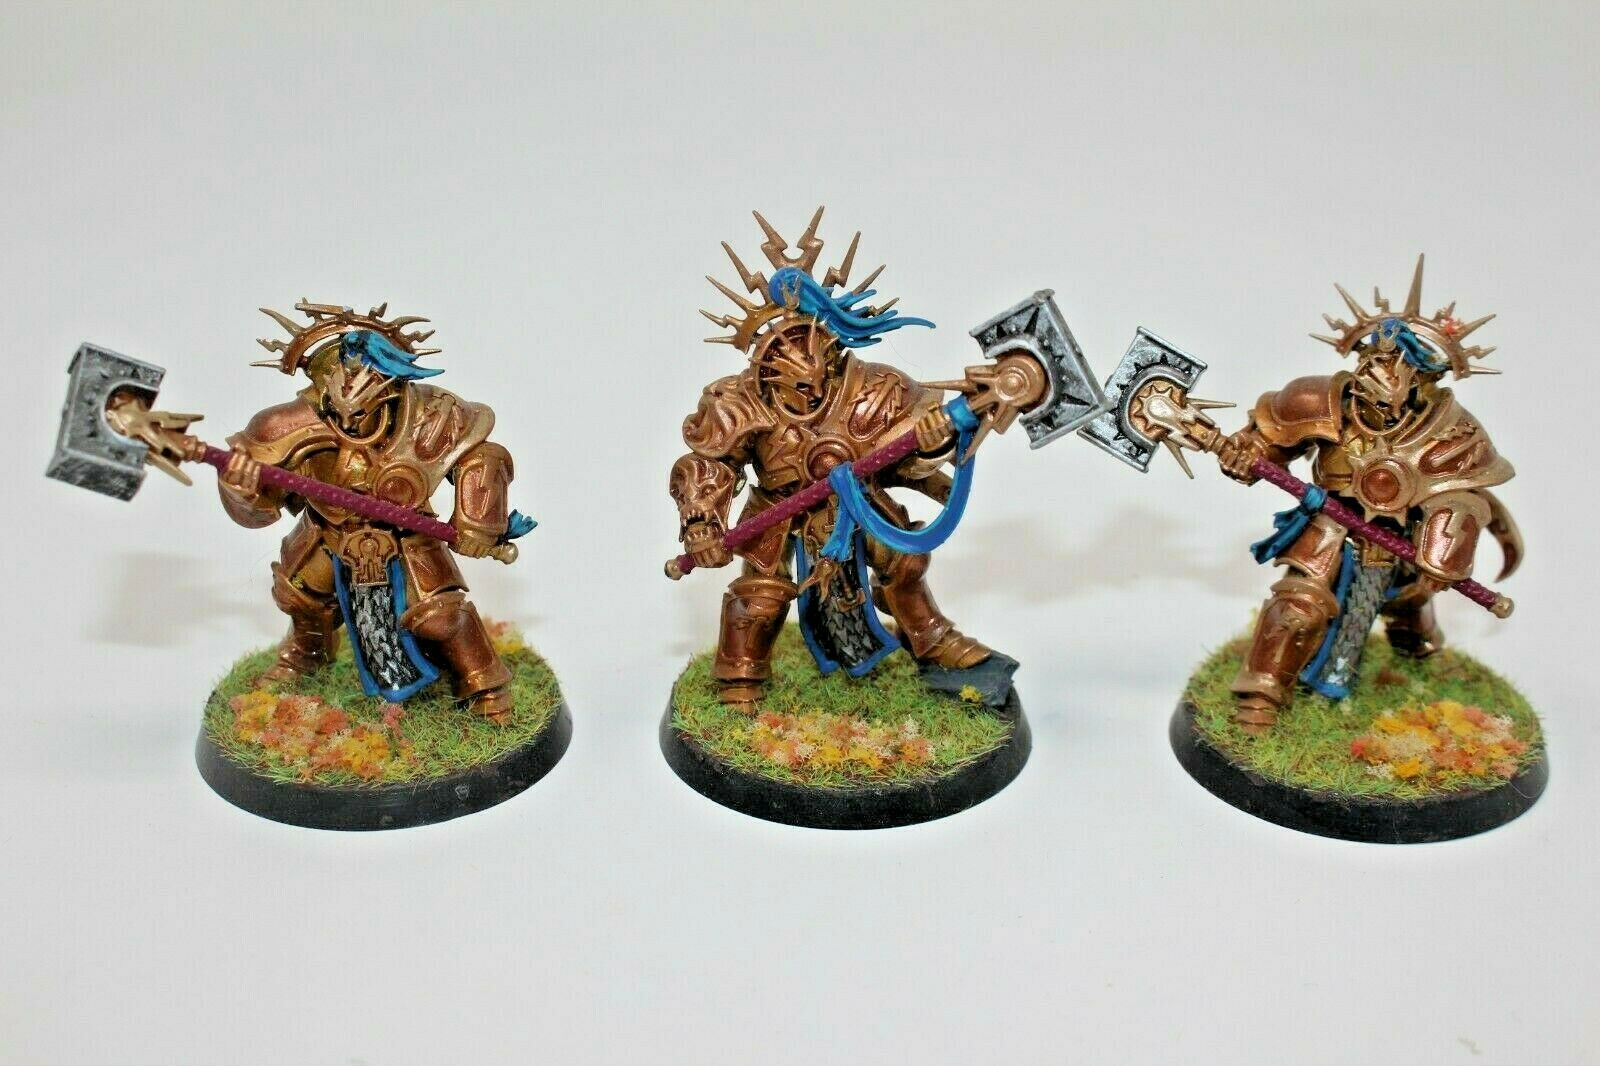 Warhammer Stormcast Eternals Retributors Well Painted - JYS89